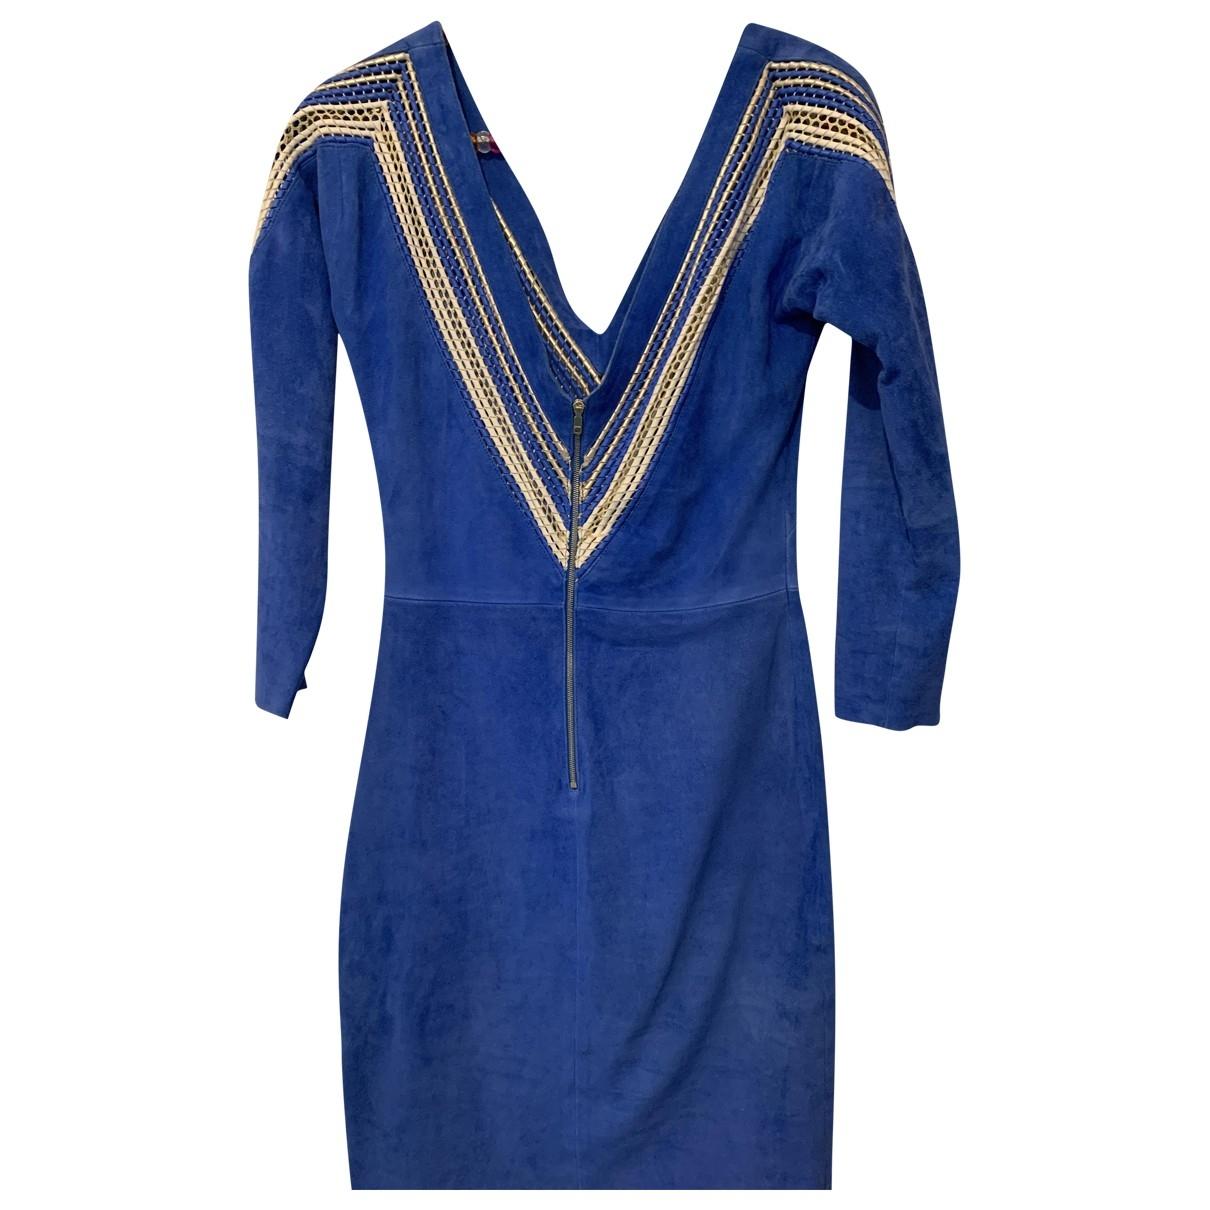 Jitrois \N Blue Cotton dress for Women 36 FR